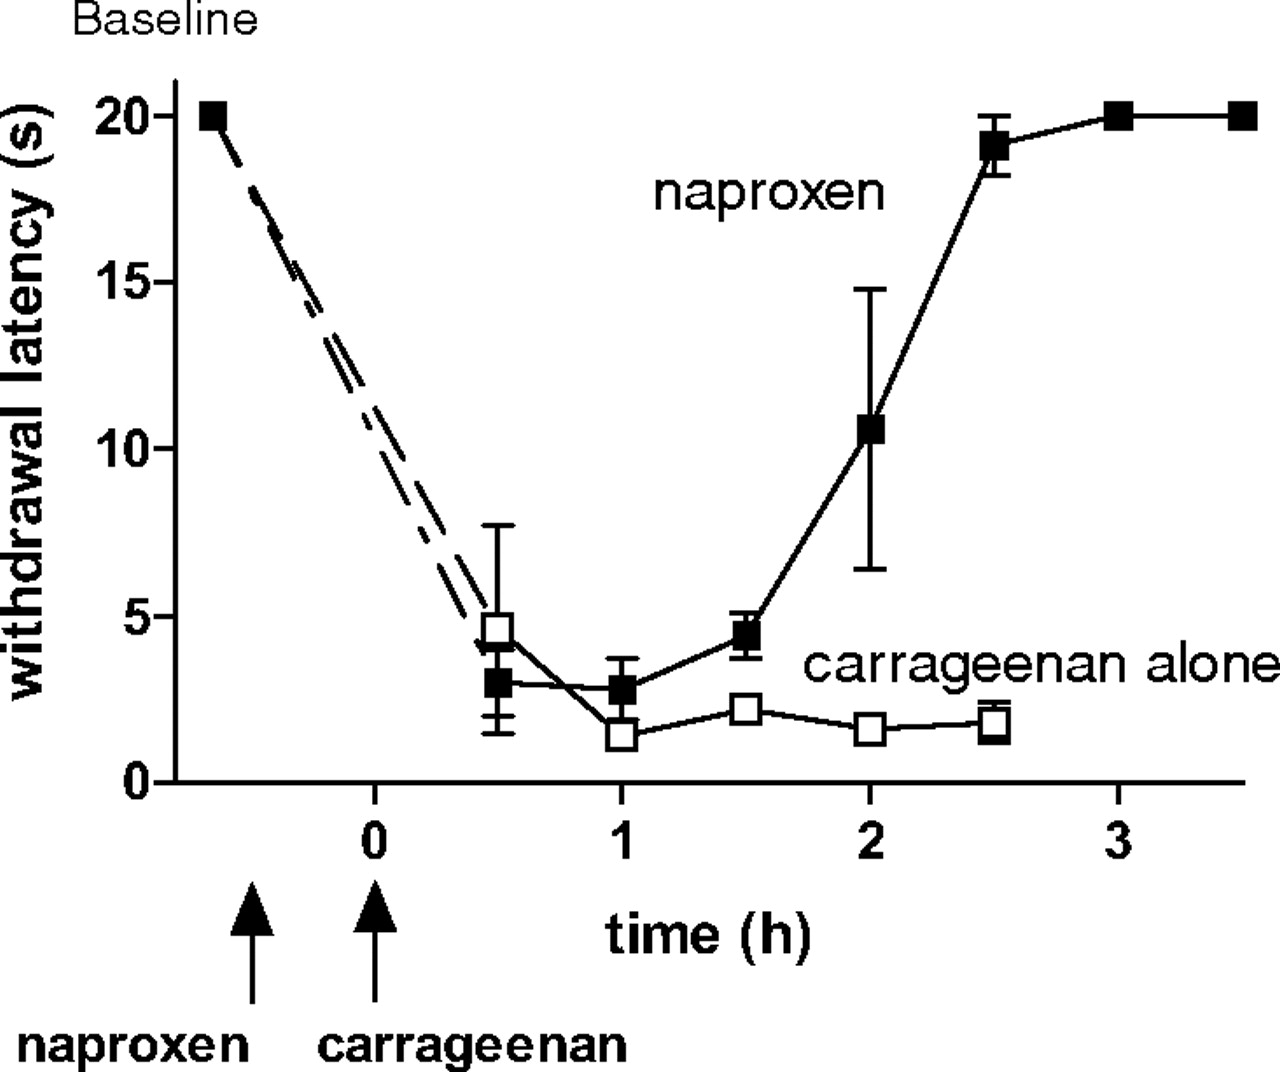 Pharmacological, Pharmacokinetic, and Primate Analgesic